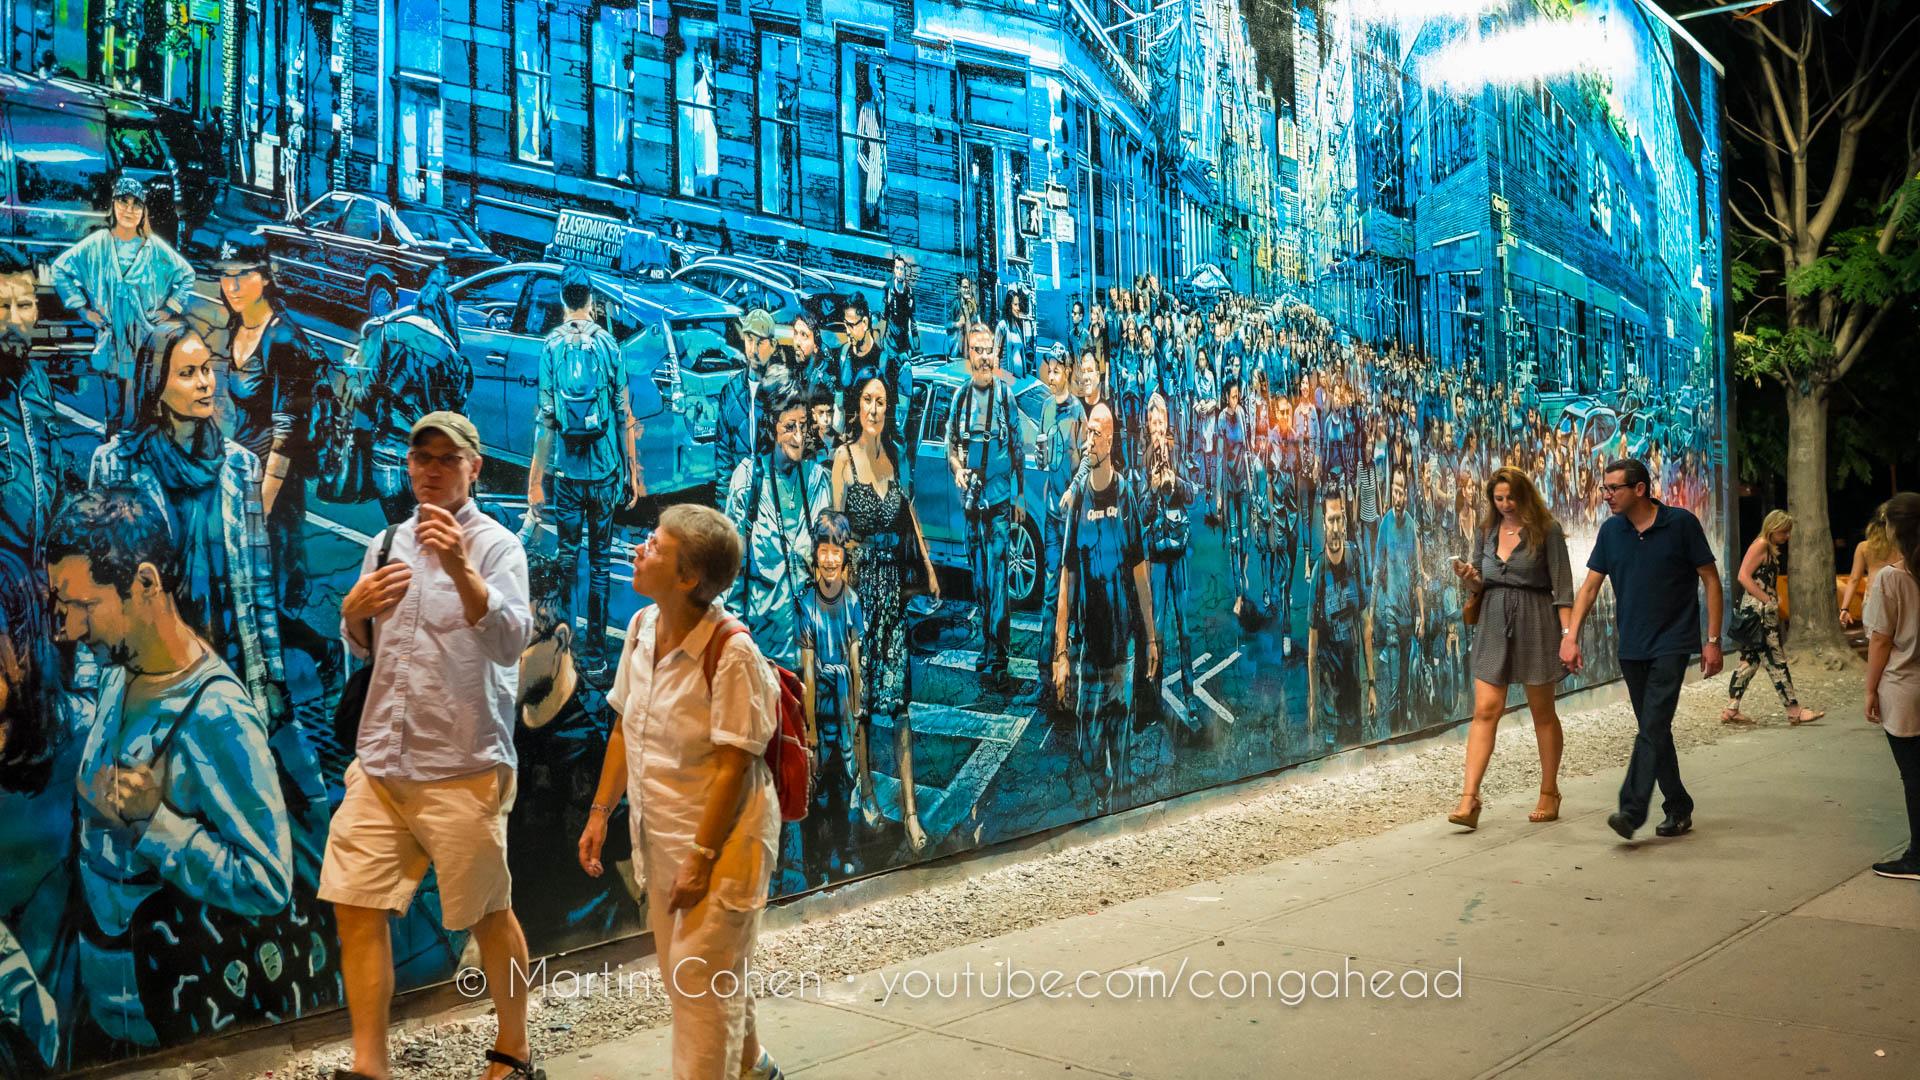 Logan Hicks S Spectacular Bowery Mural Congahead